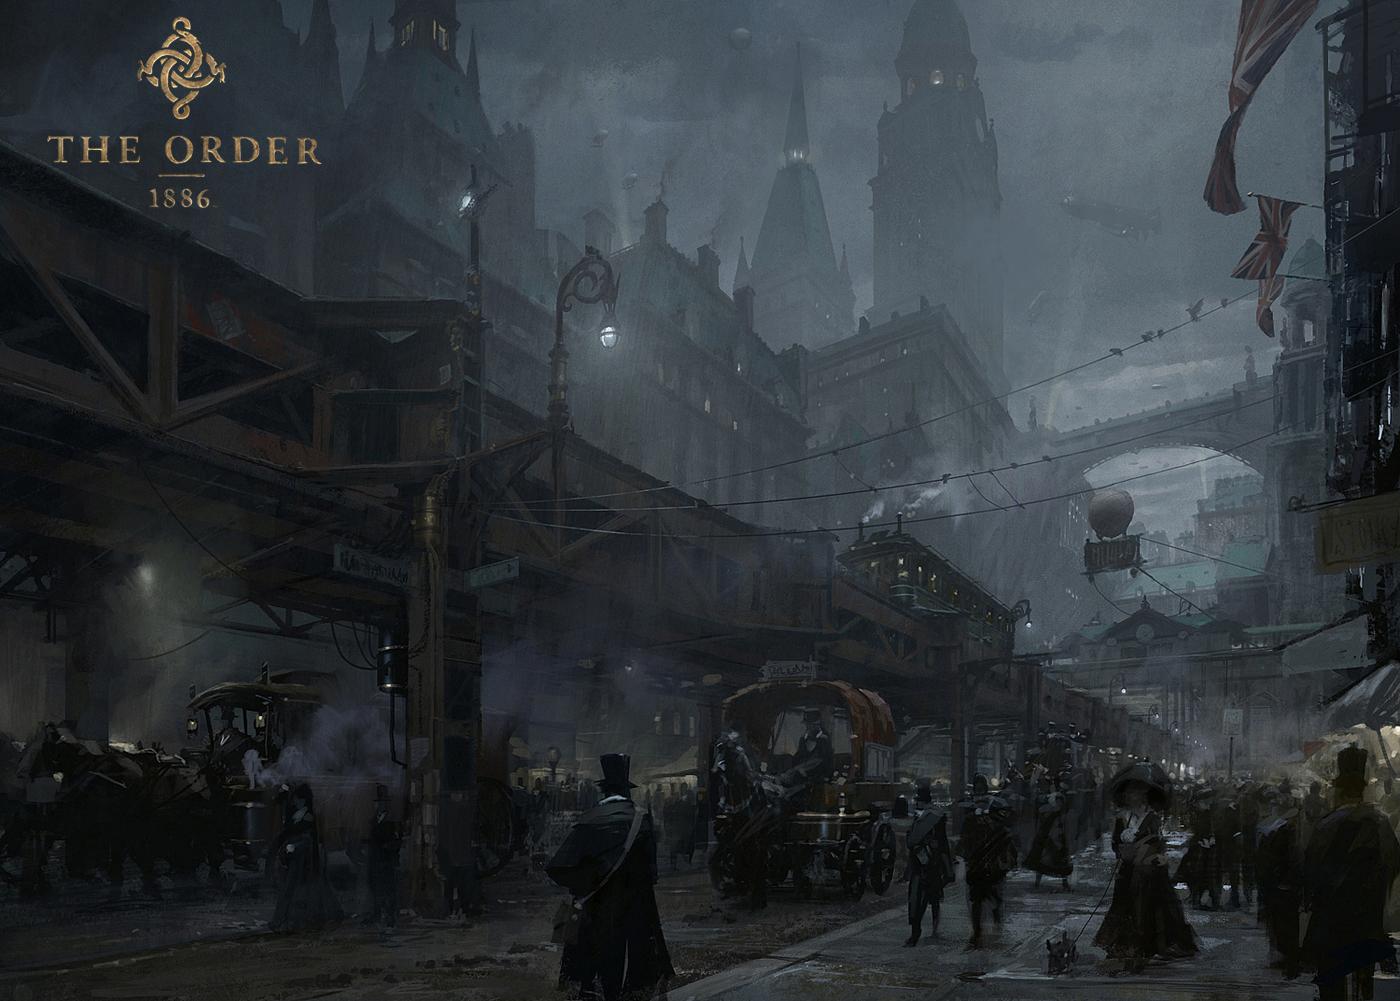 the-order-1886-art-2